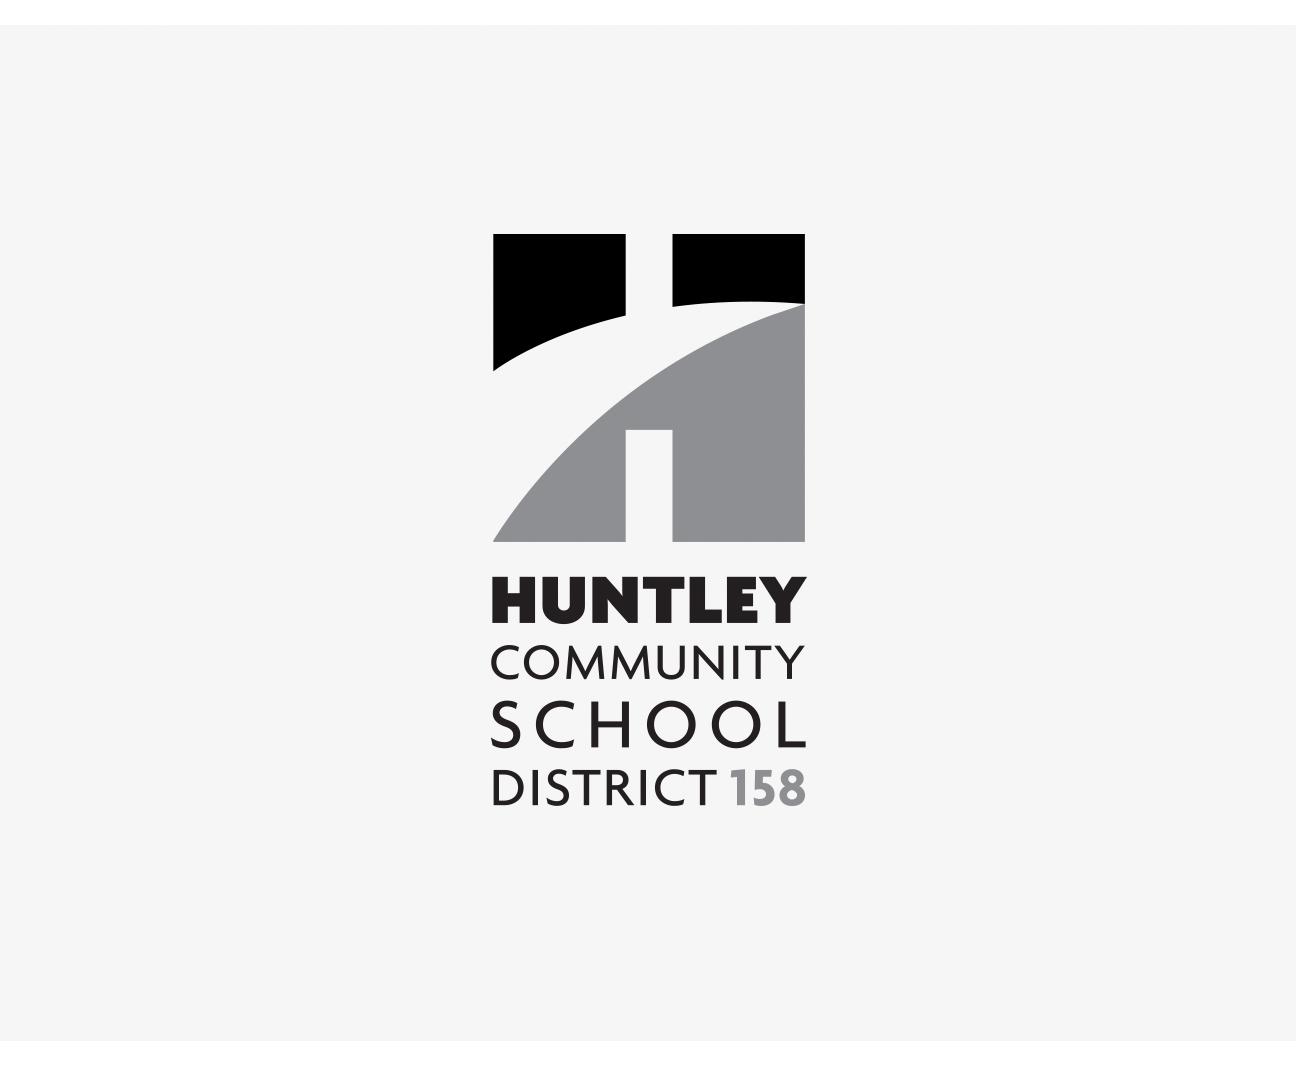 logo_huntley_school_district_gs.jpg